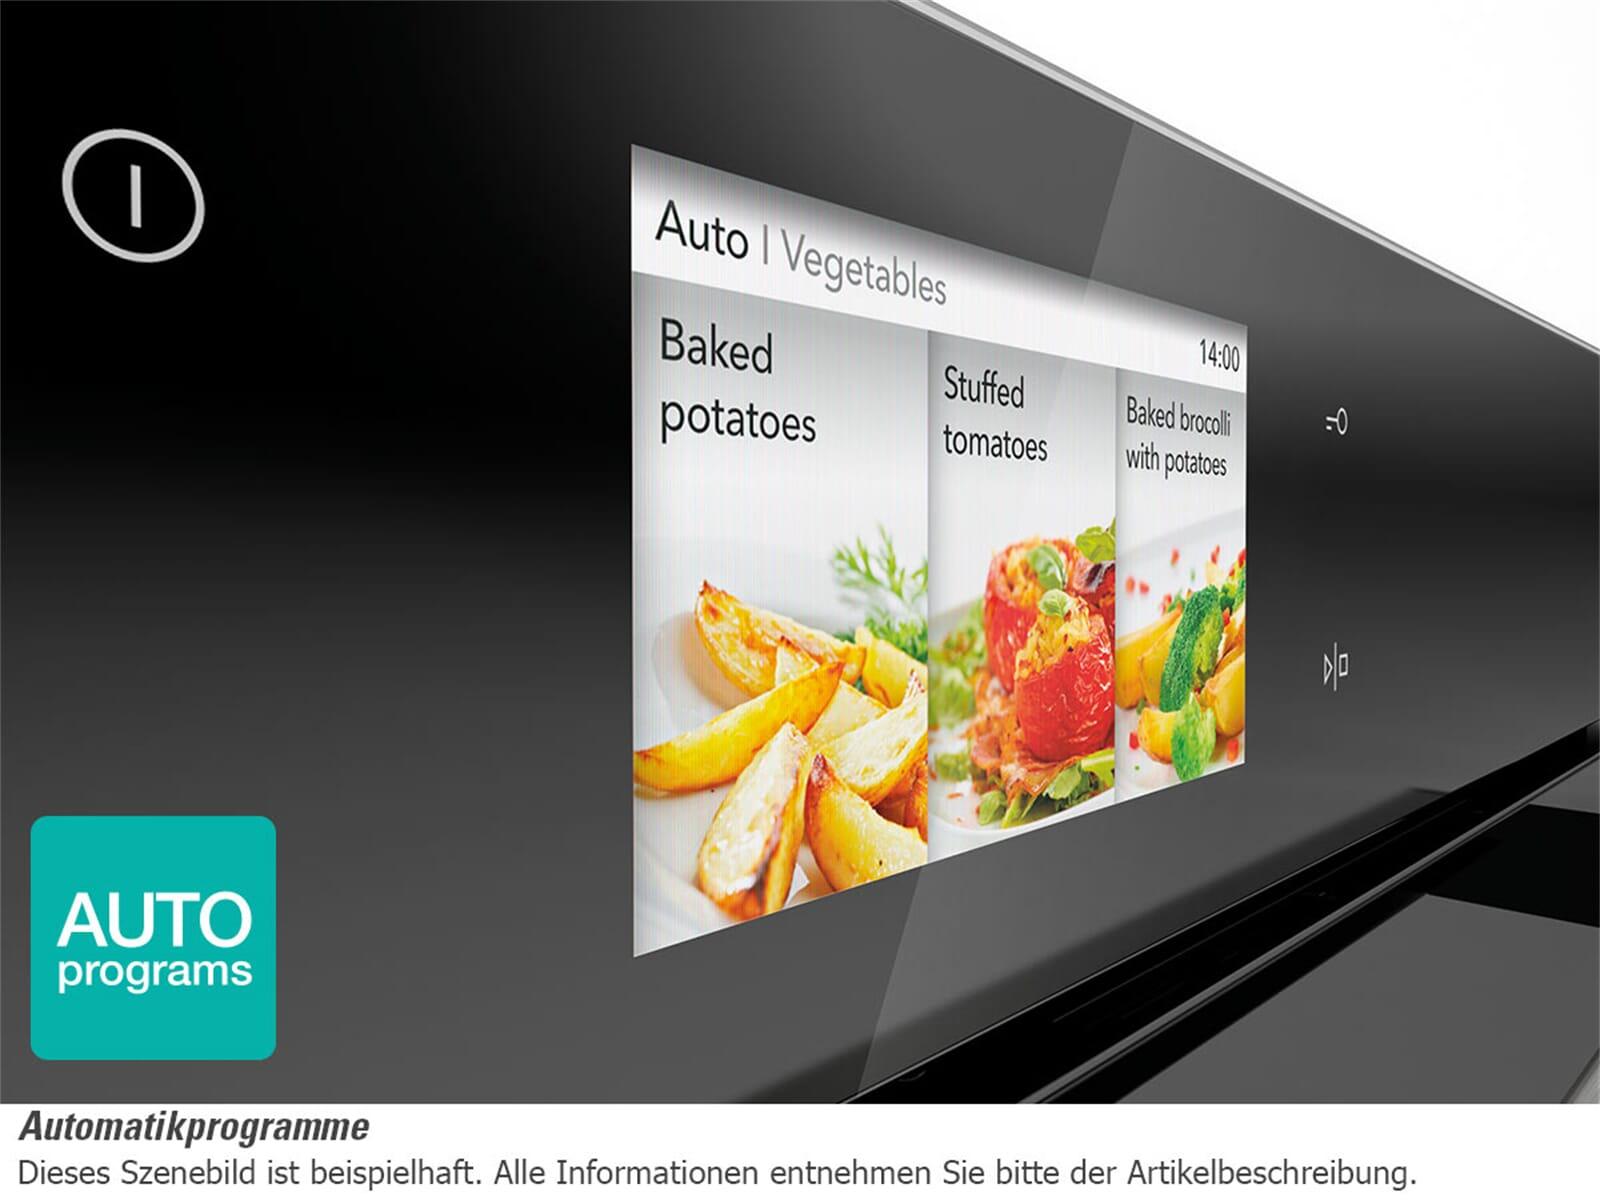 Retro Kühlschrank Ebd : Gorenje ebd 600 e dampfbackofen edelstahl